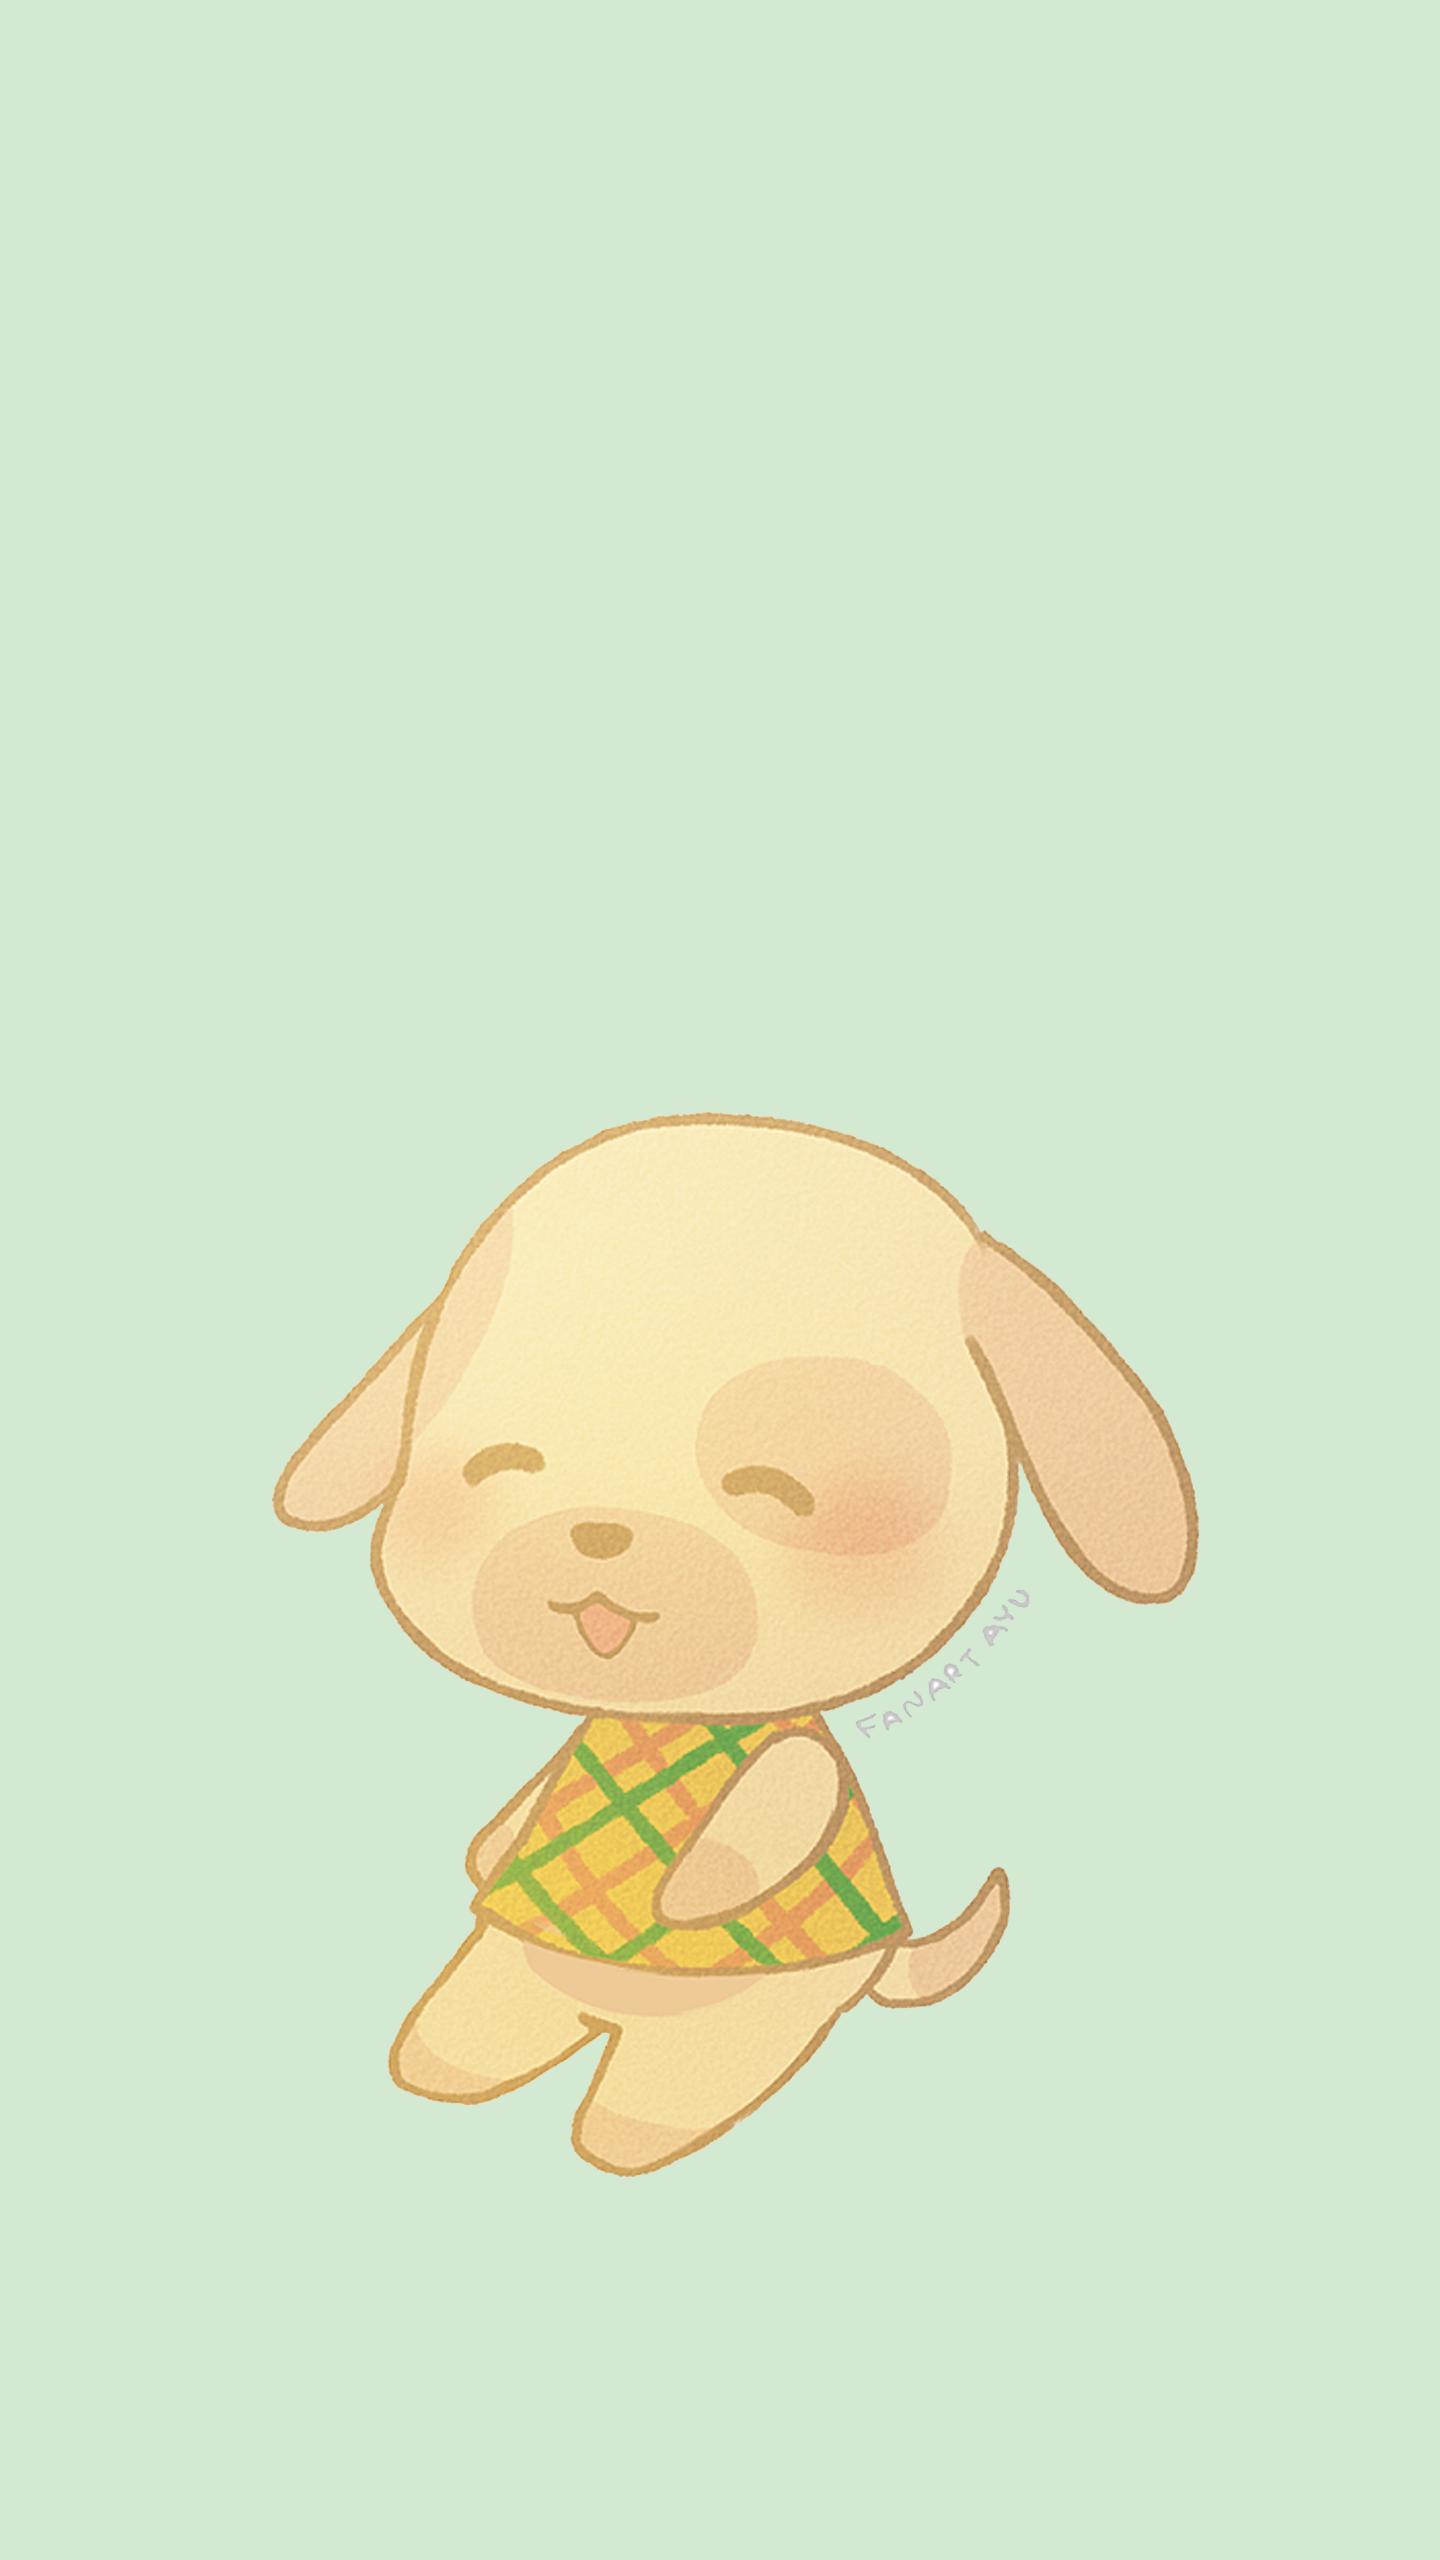 Goldie Animal Crossing Animal Crossing Characters Animal